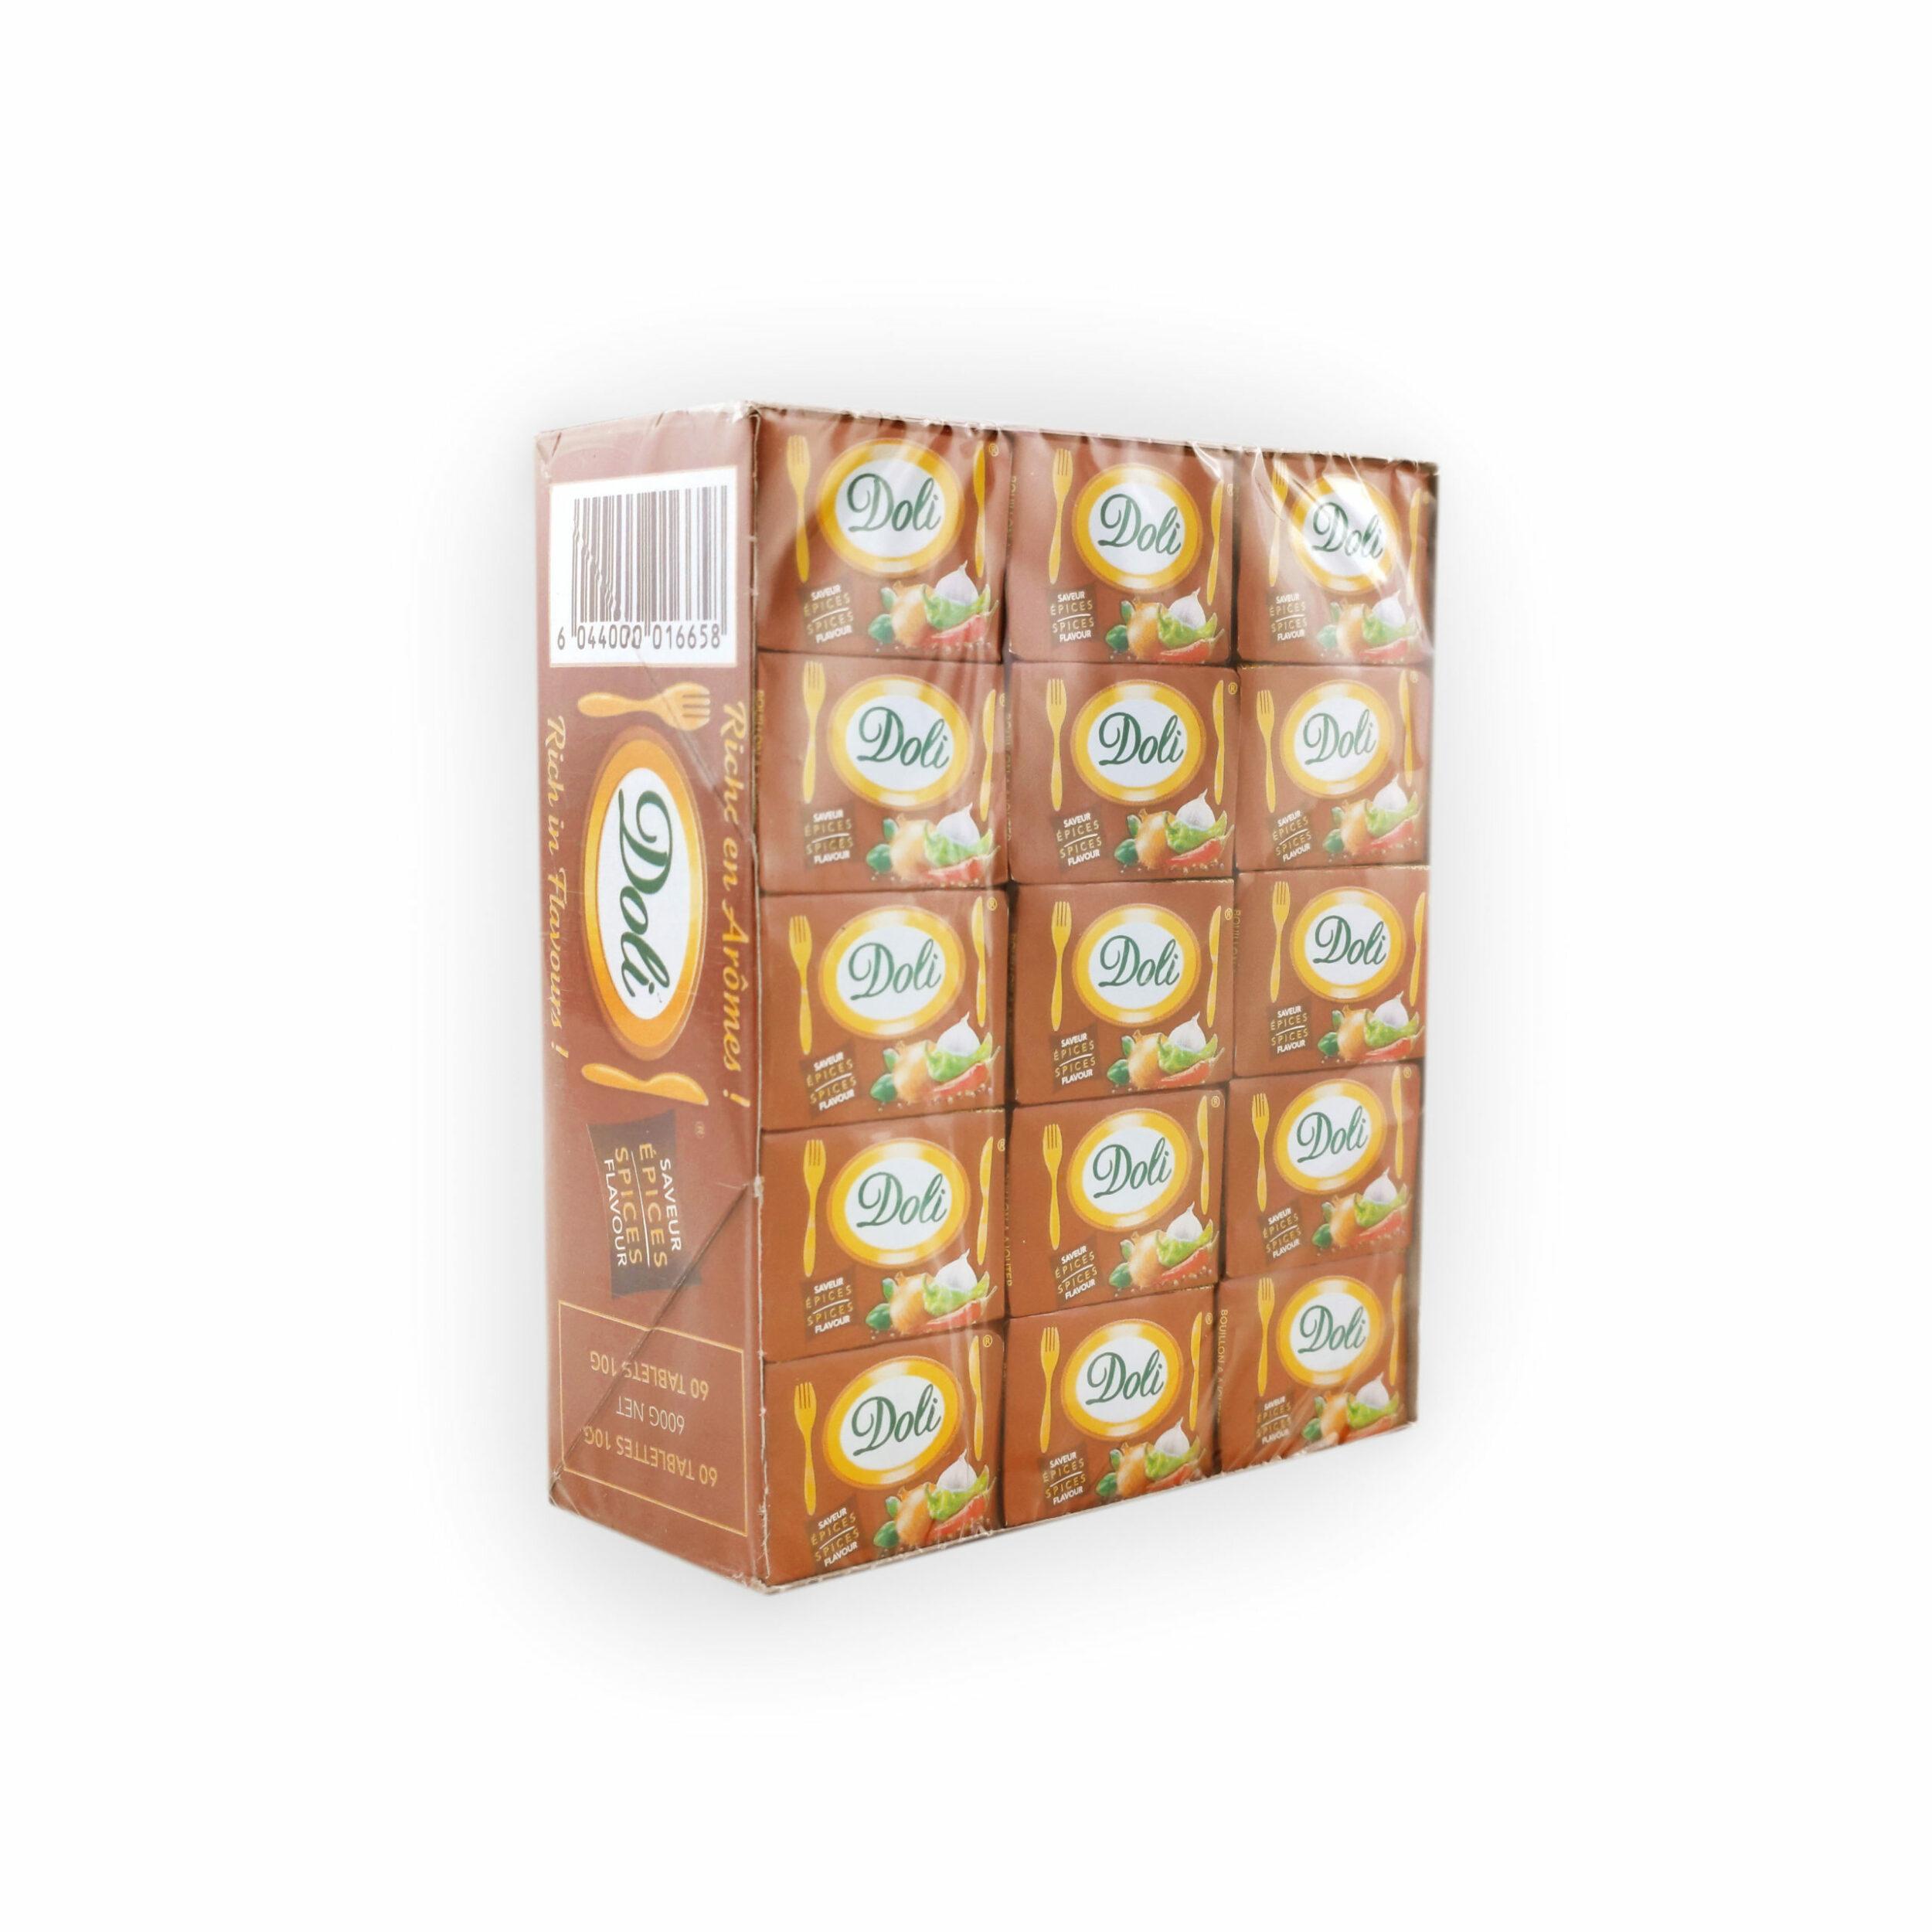 cube-doli-2-site-web-moushenco